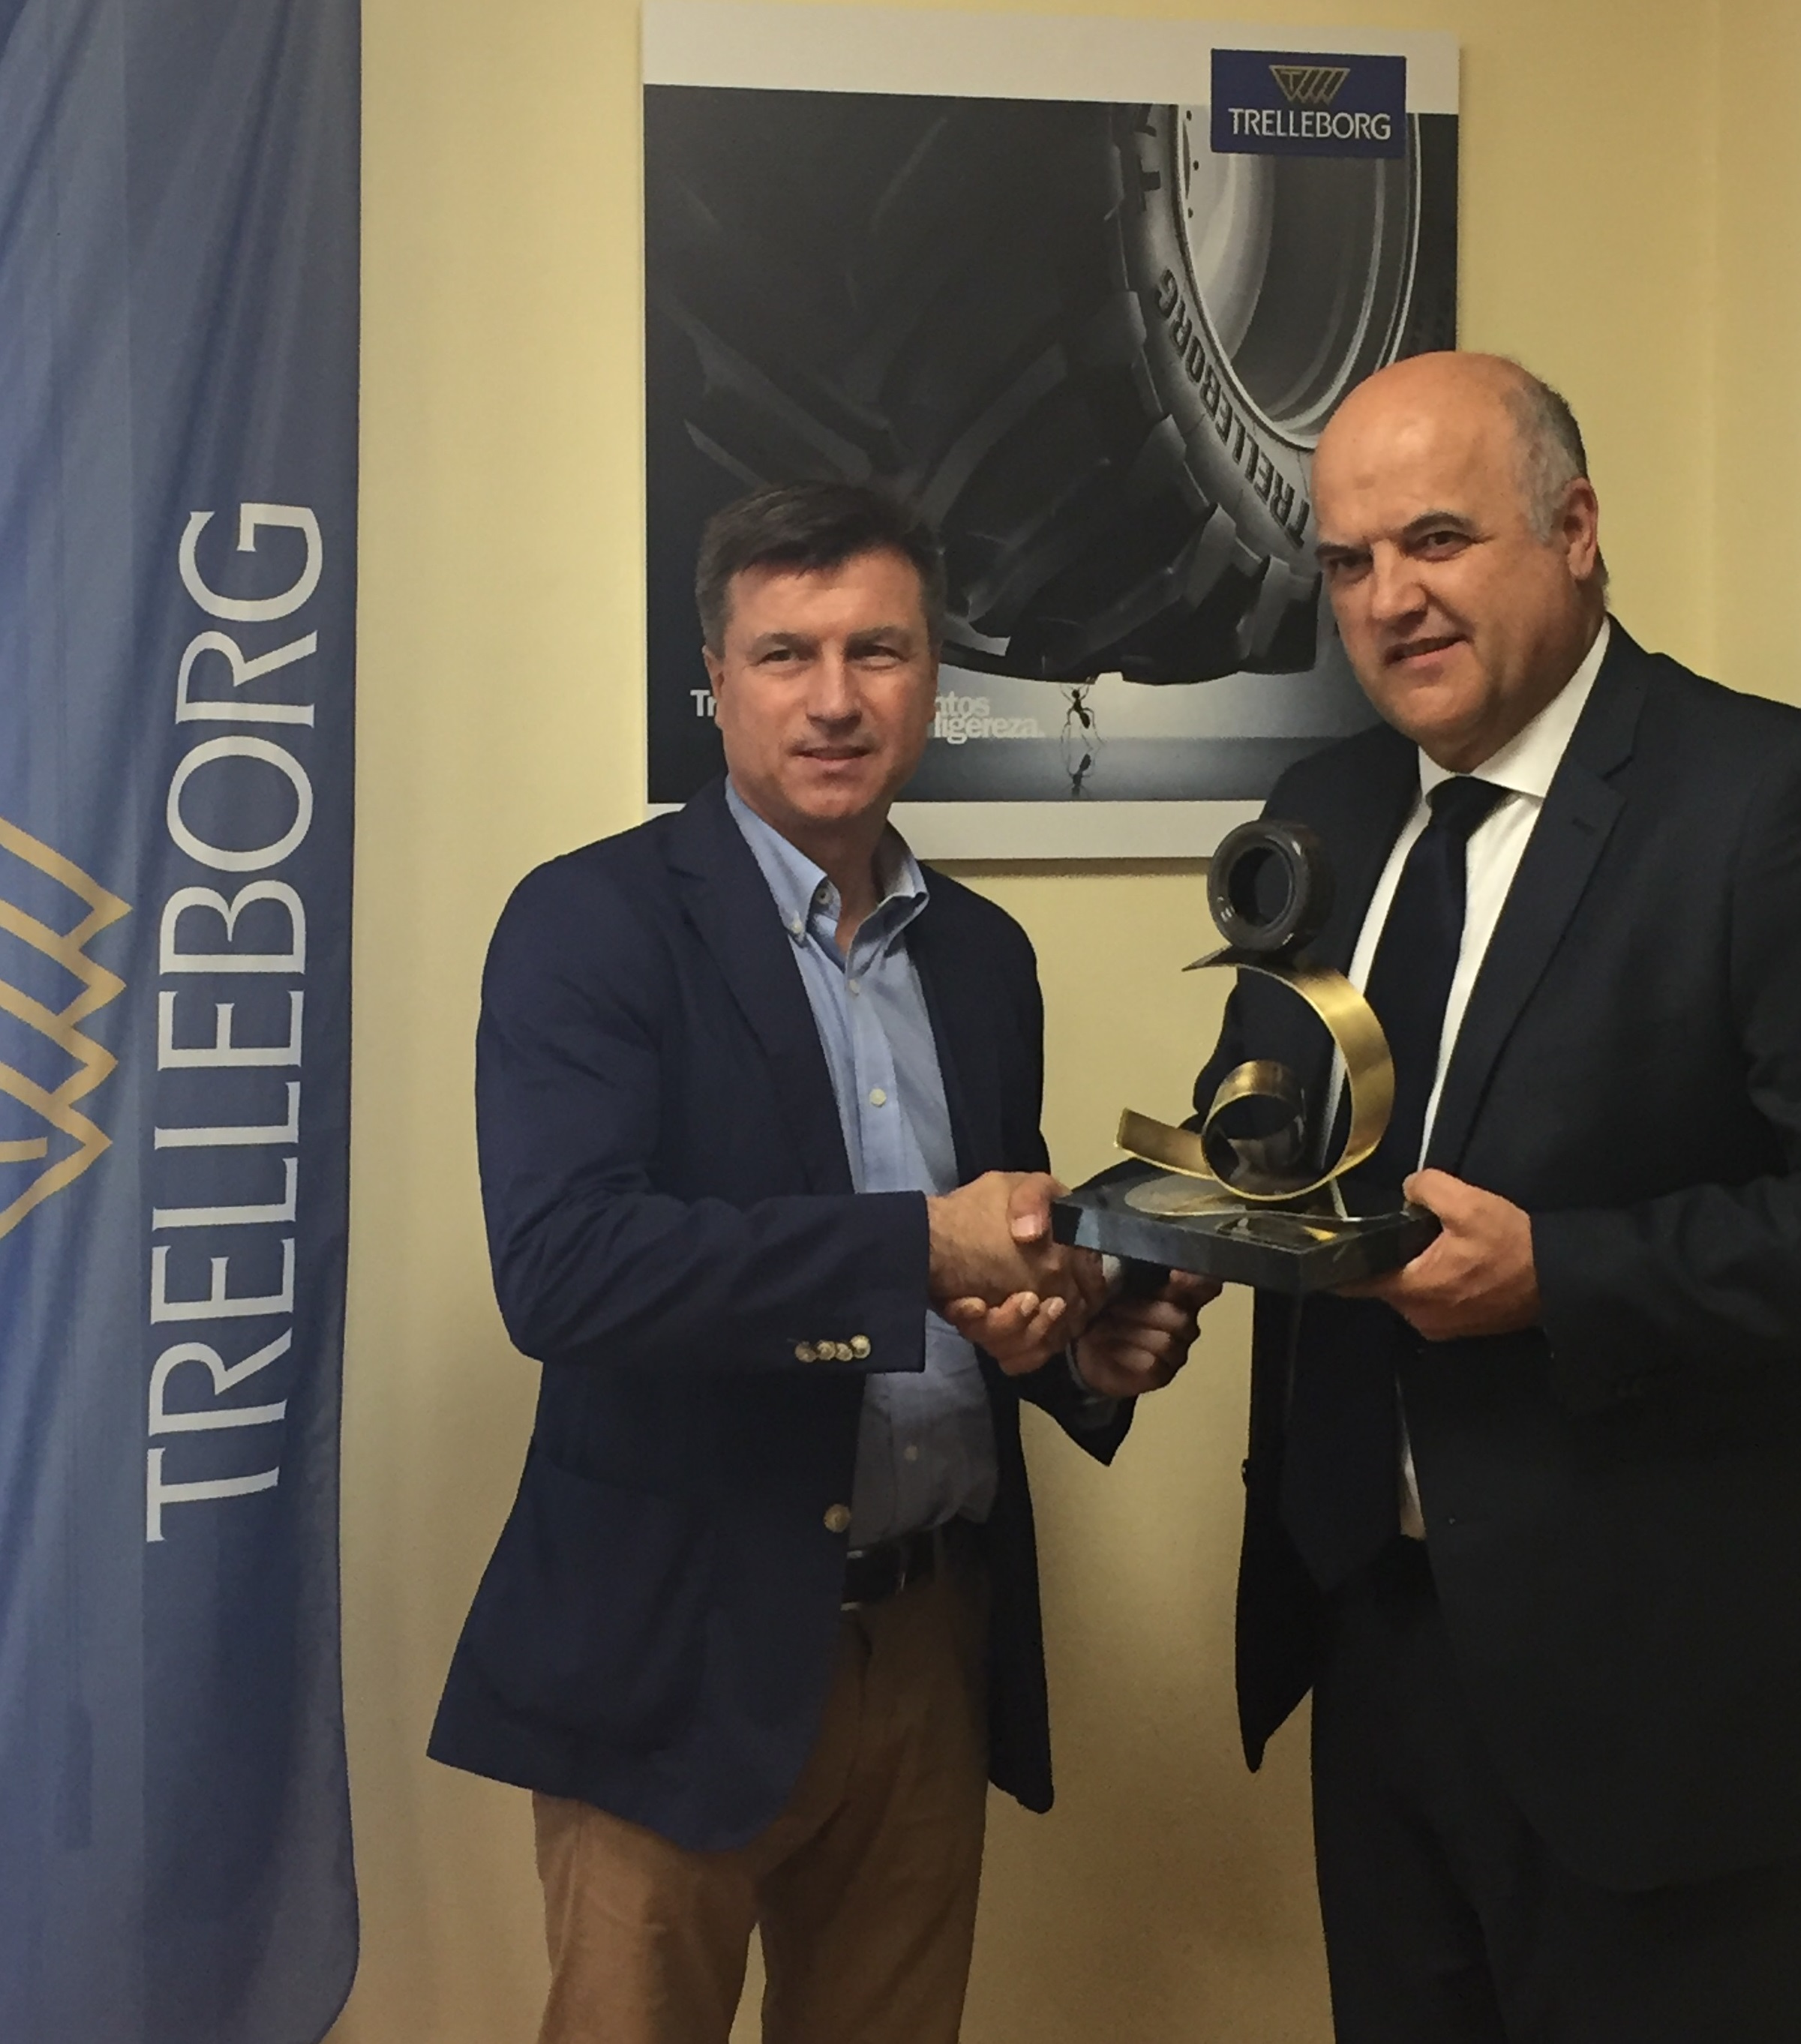 Awarding Trelleborg